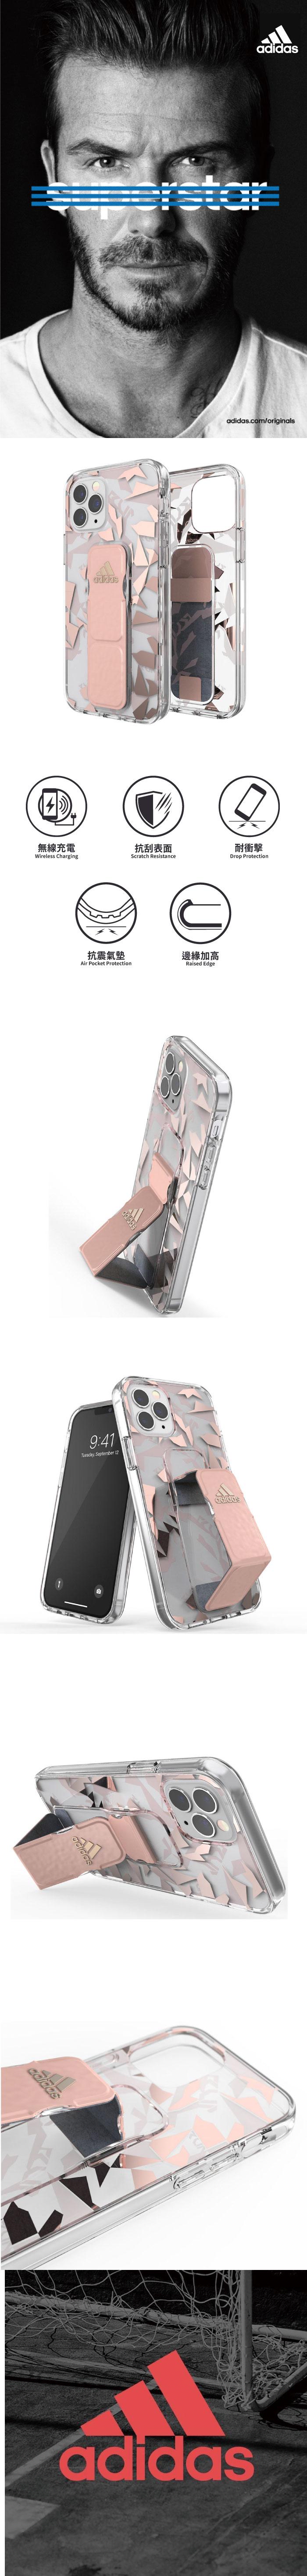 Adidas|iPhone 12 Pro Max 手機殼 Sport 幾何圖形支架 粉色